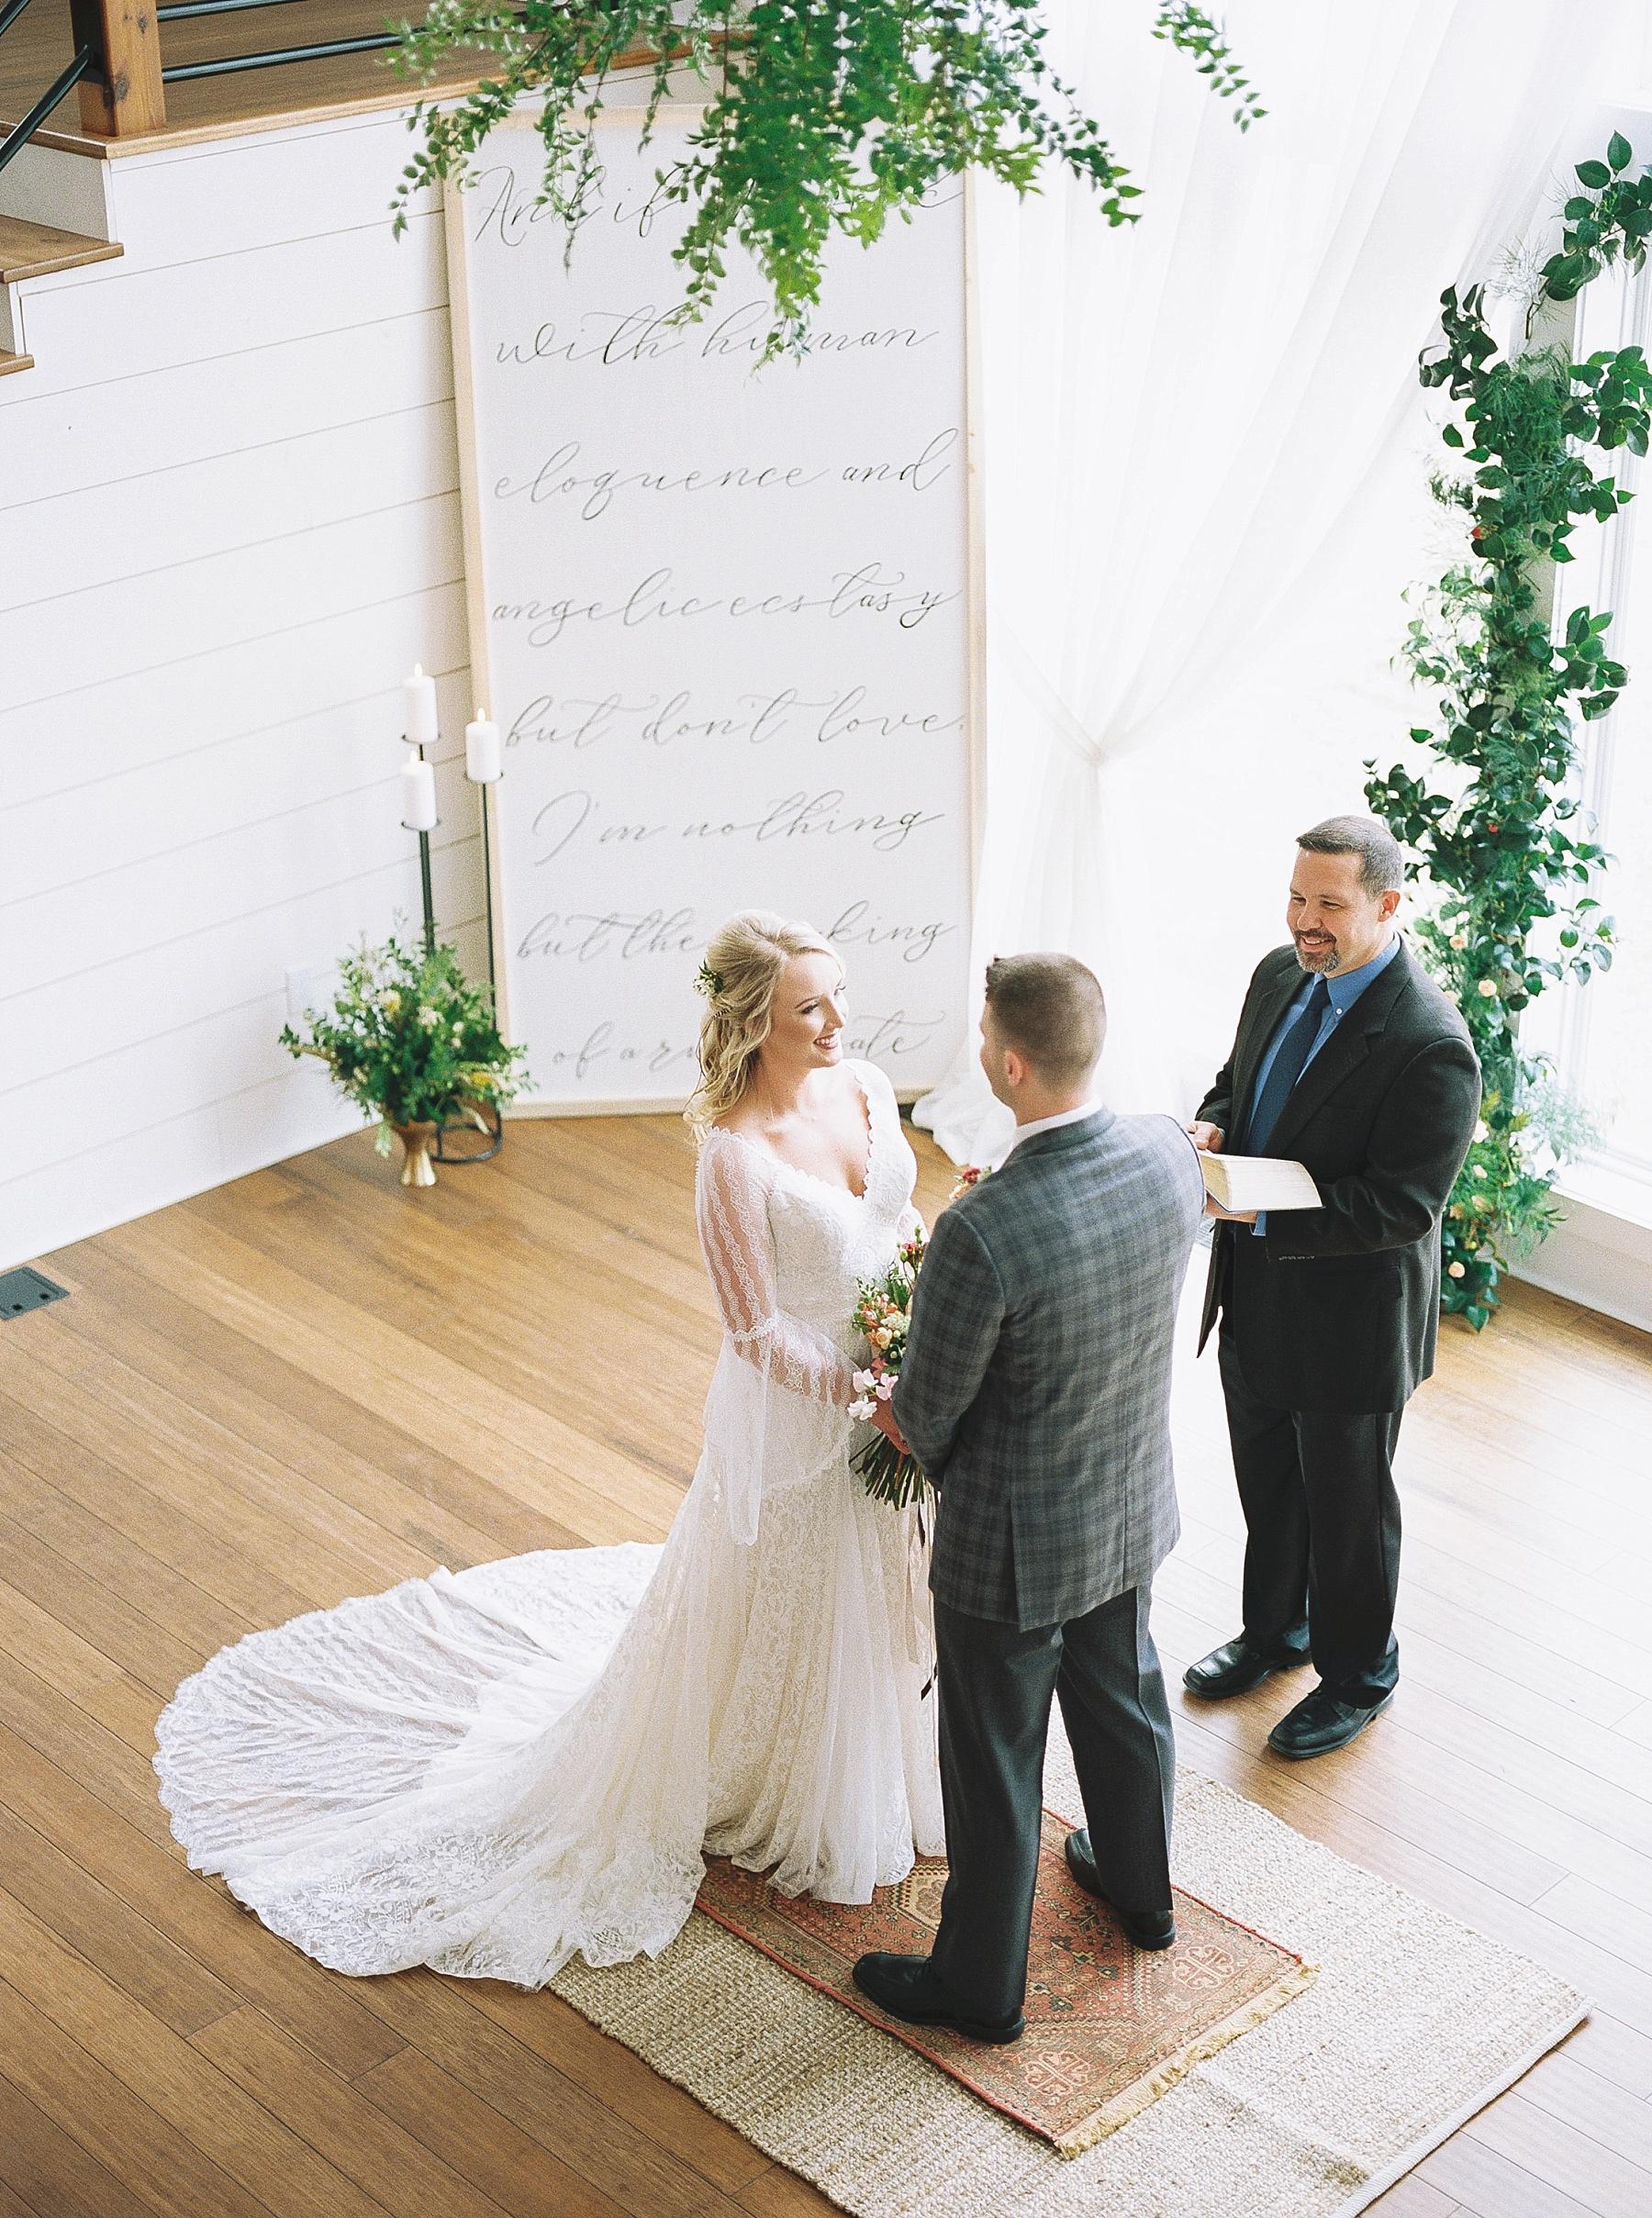 Eclectic Scandinavian Winter Wedding in All White Venue Emerson Fields by Kelsi Kliethermes Photography Best Missouri and Maui Wedding Photographer_0075.jpg